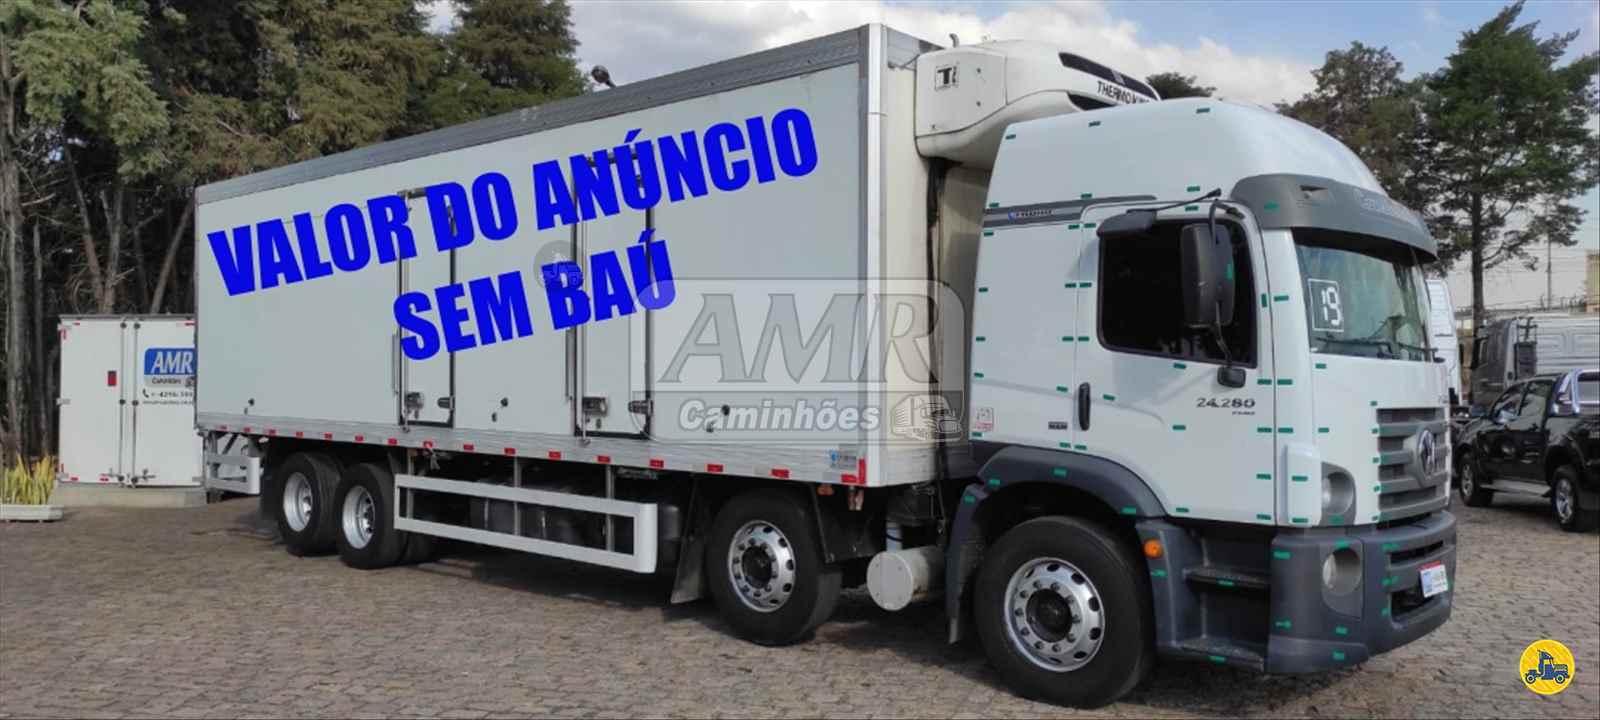 CAMINHAO VOLKSWAGEN VW 24280 Chassis BiTruck 8x2 AMR Caminhões JUNDIAI SÃO PAULO SP